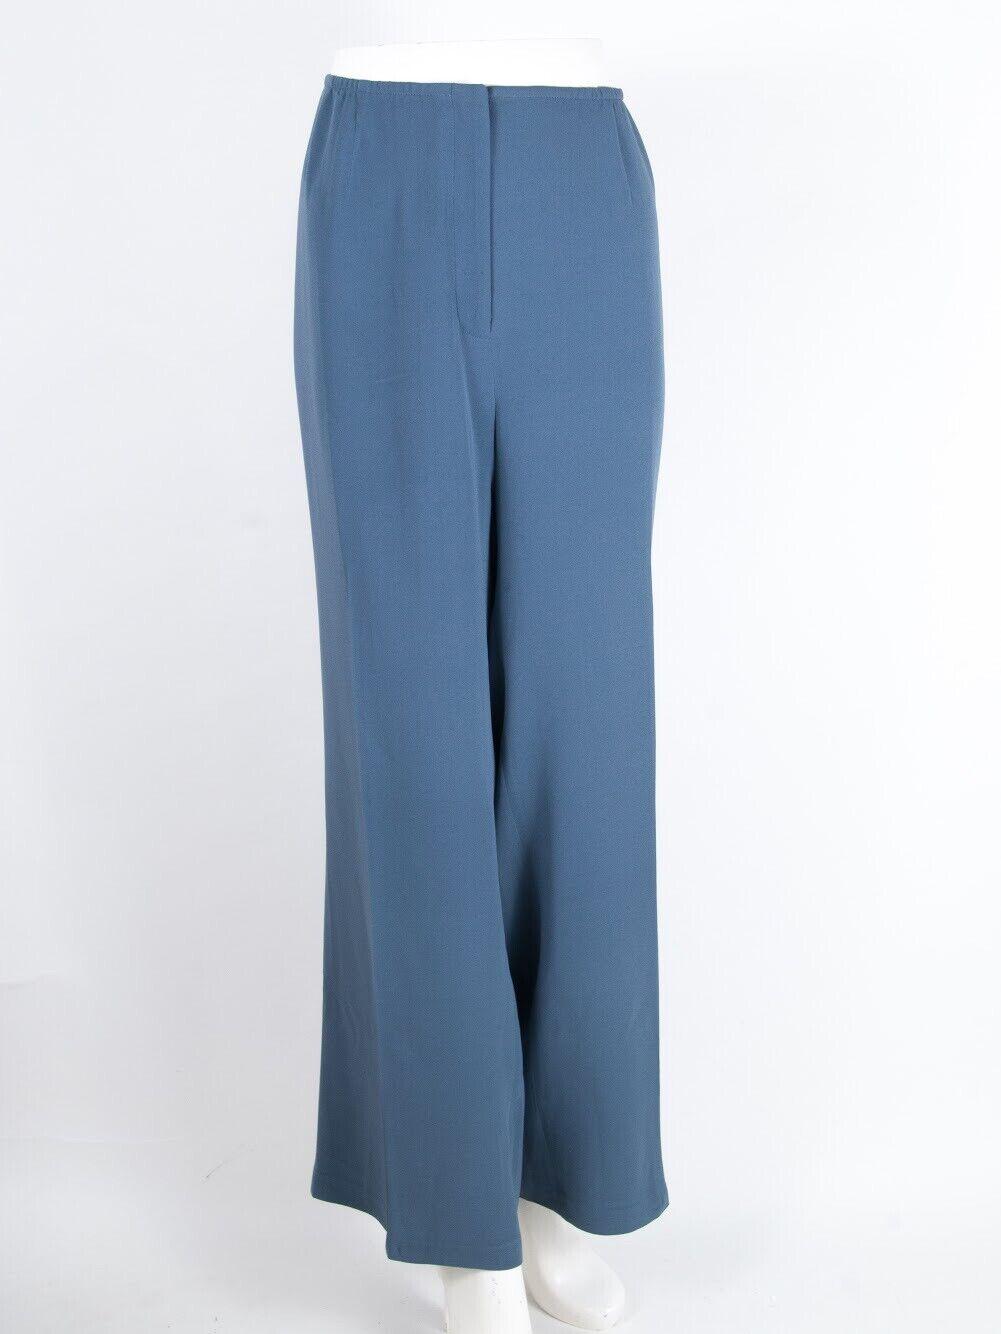 Eileen fisher Woman Pants Wide Leg Full Silk Spandex Casual Or Dress bluee 1x